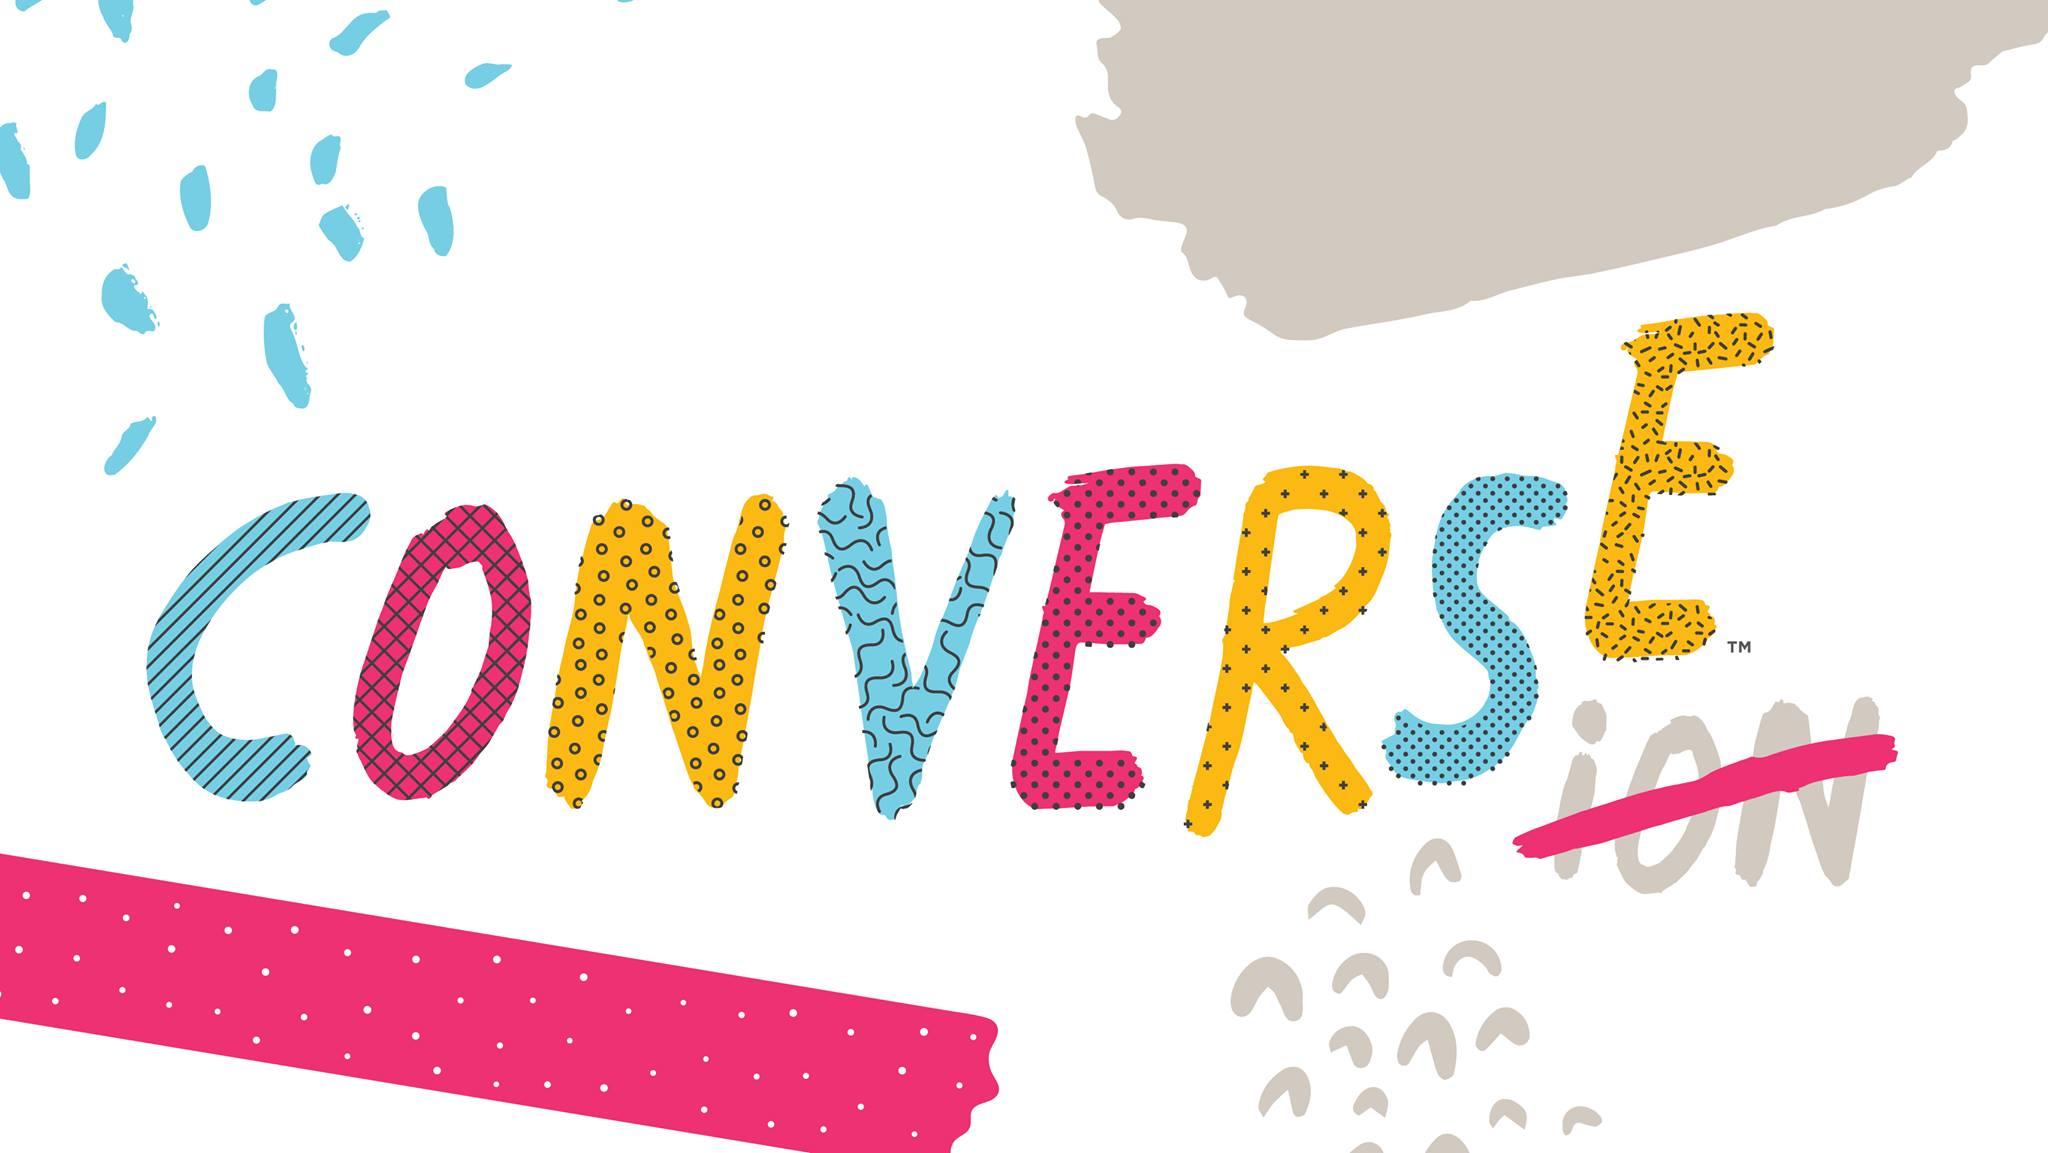 Converse facebook picture.jpg